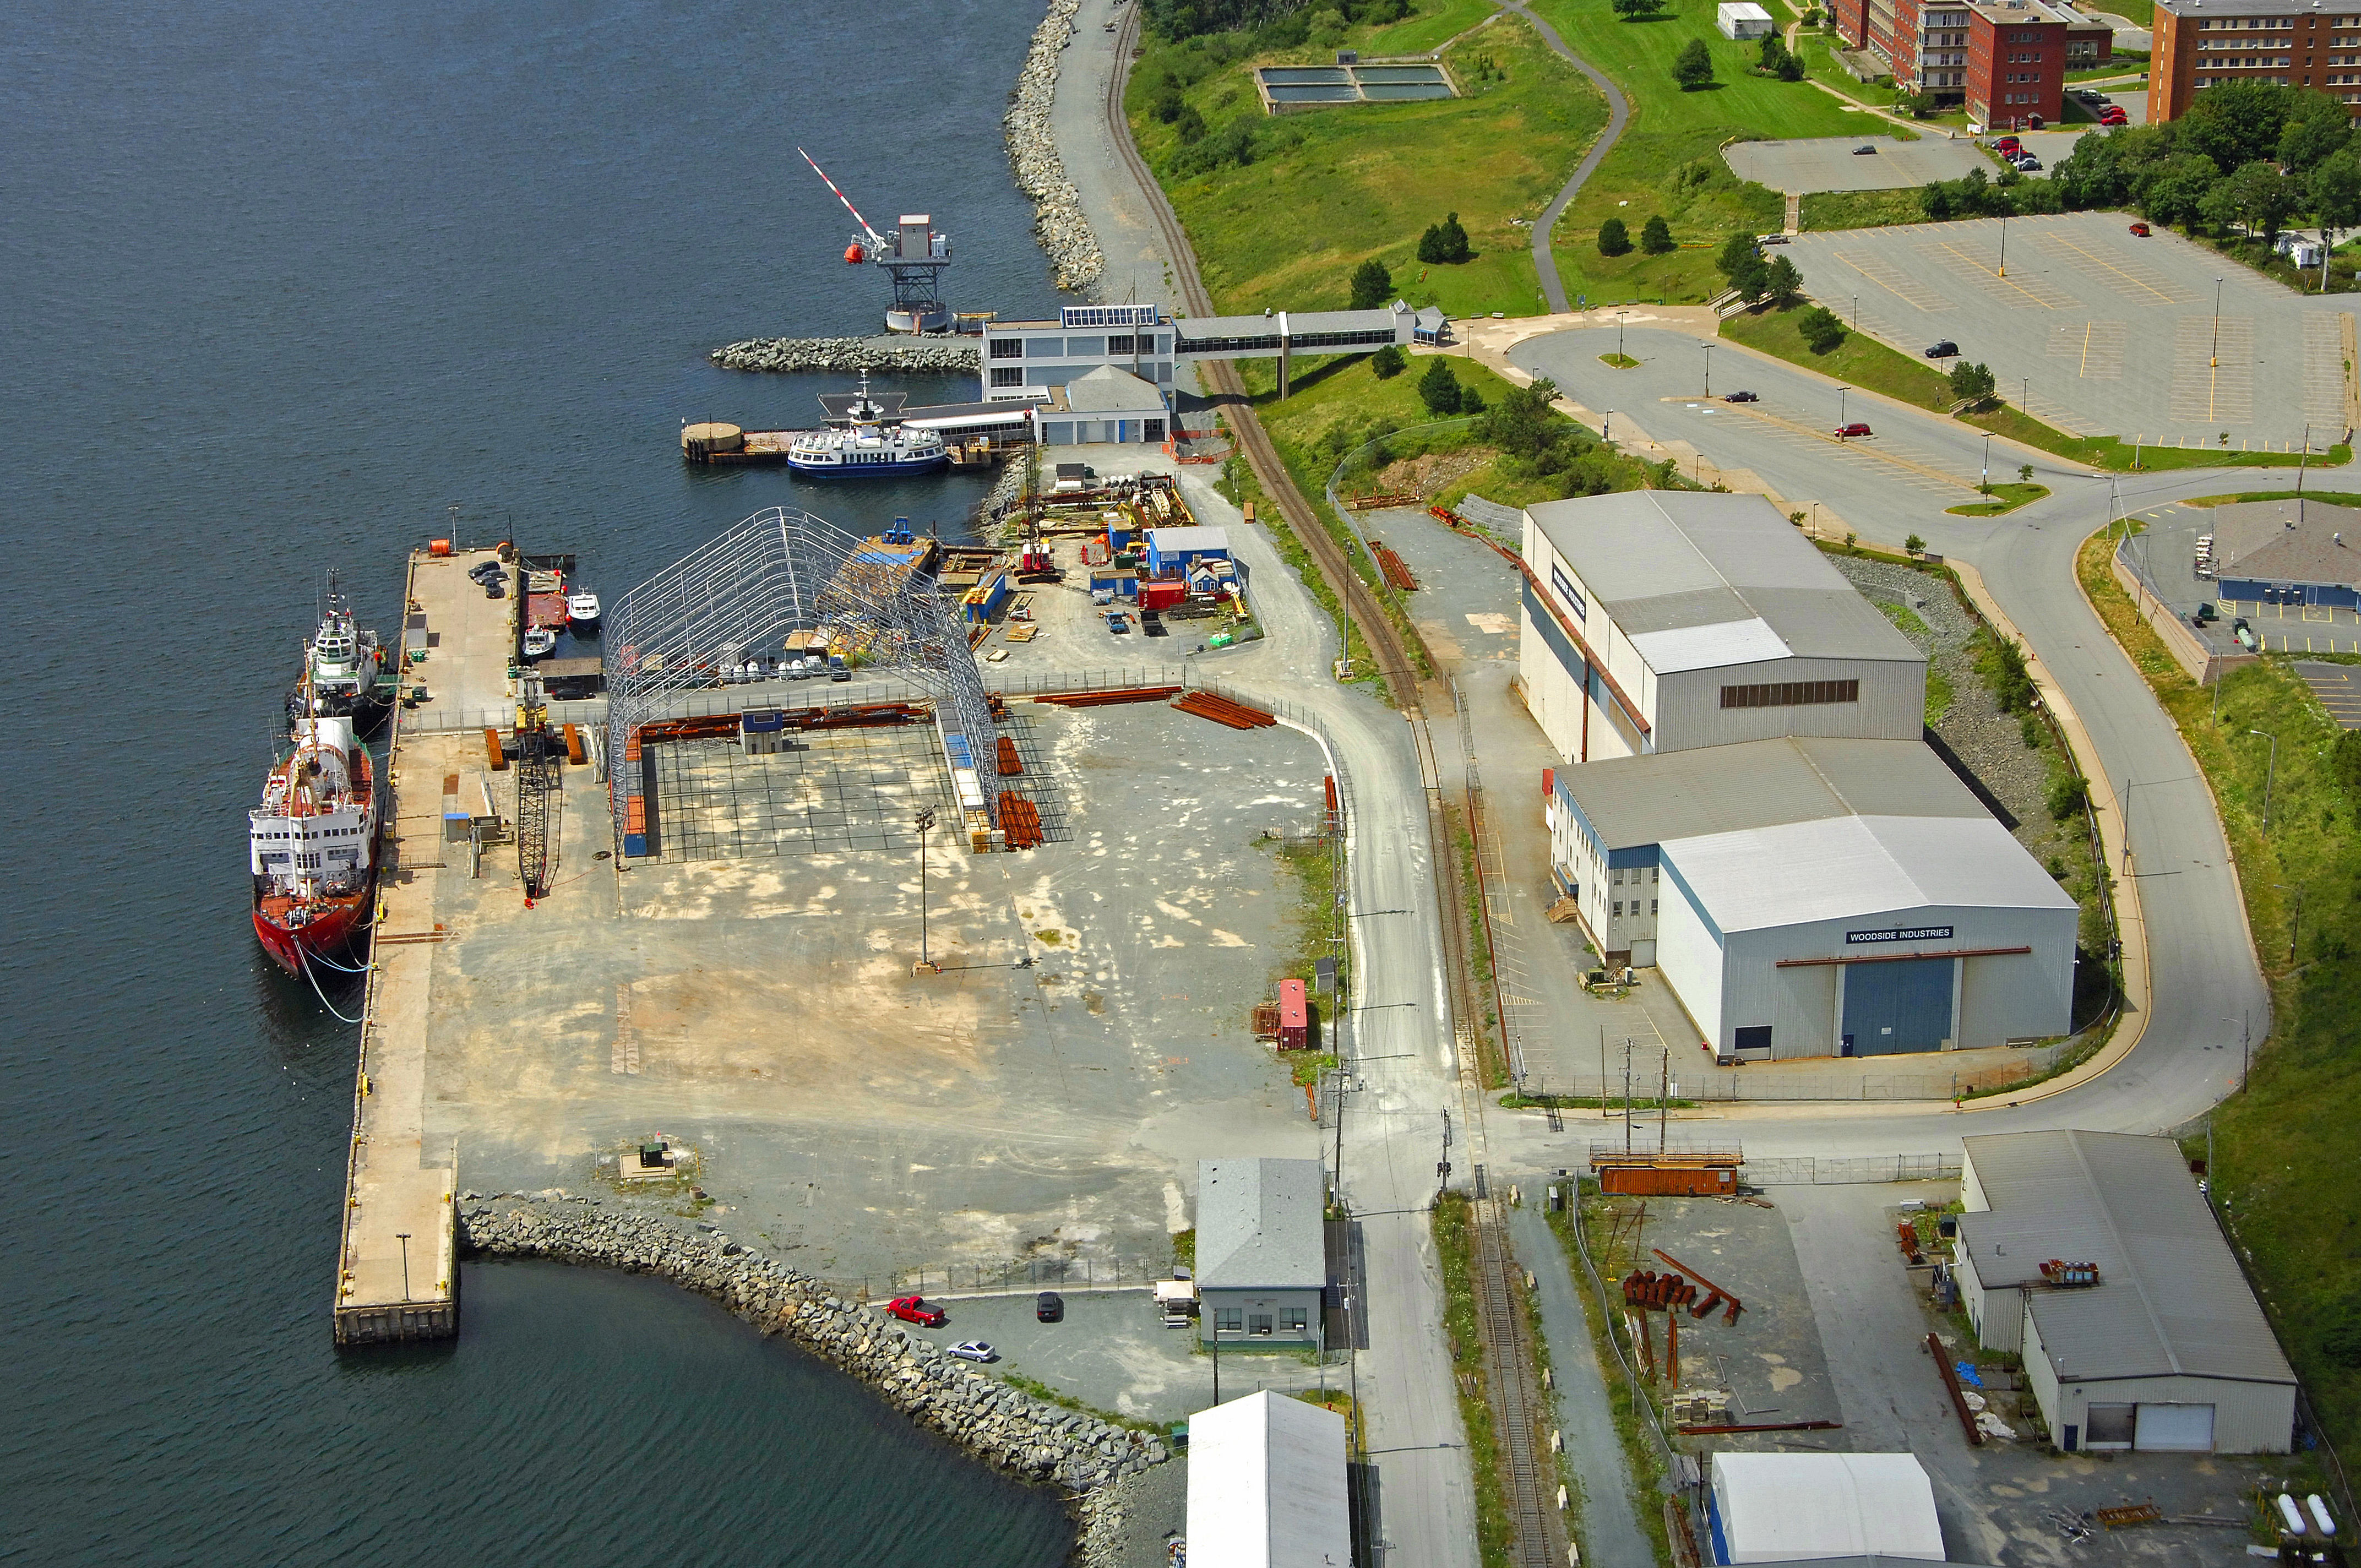 Woodside Atlantic Wharf Harbour in Halifax, NS, Canada